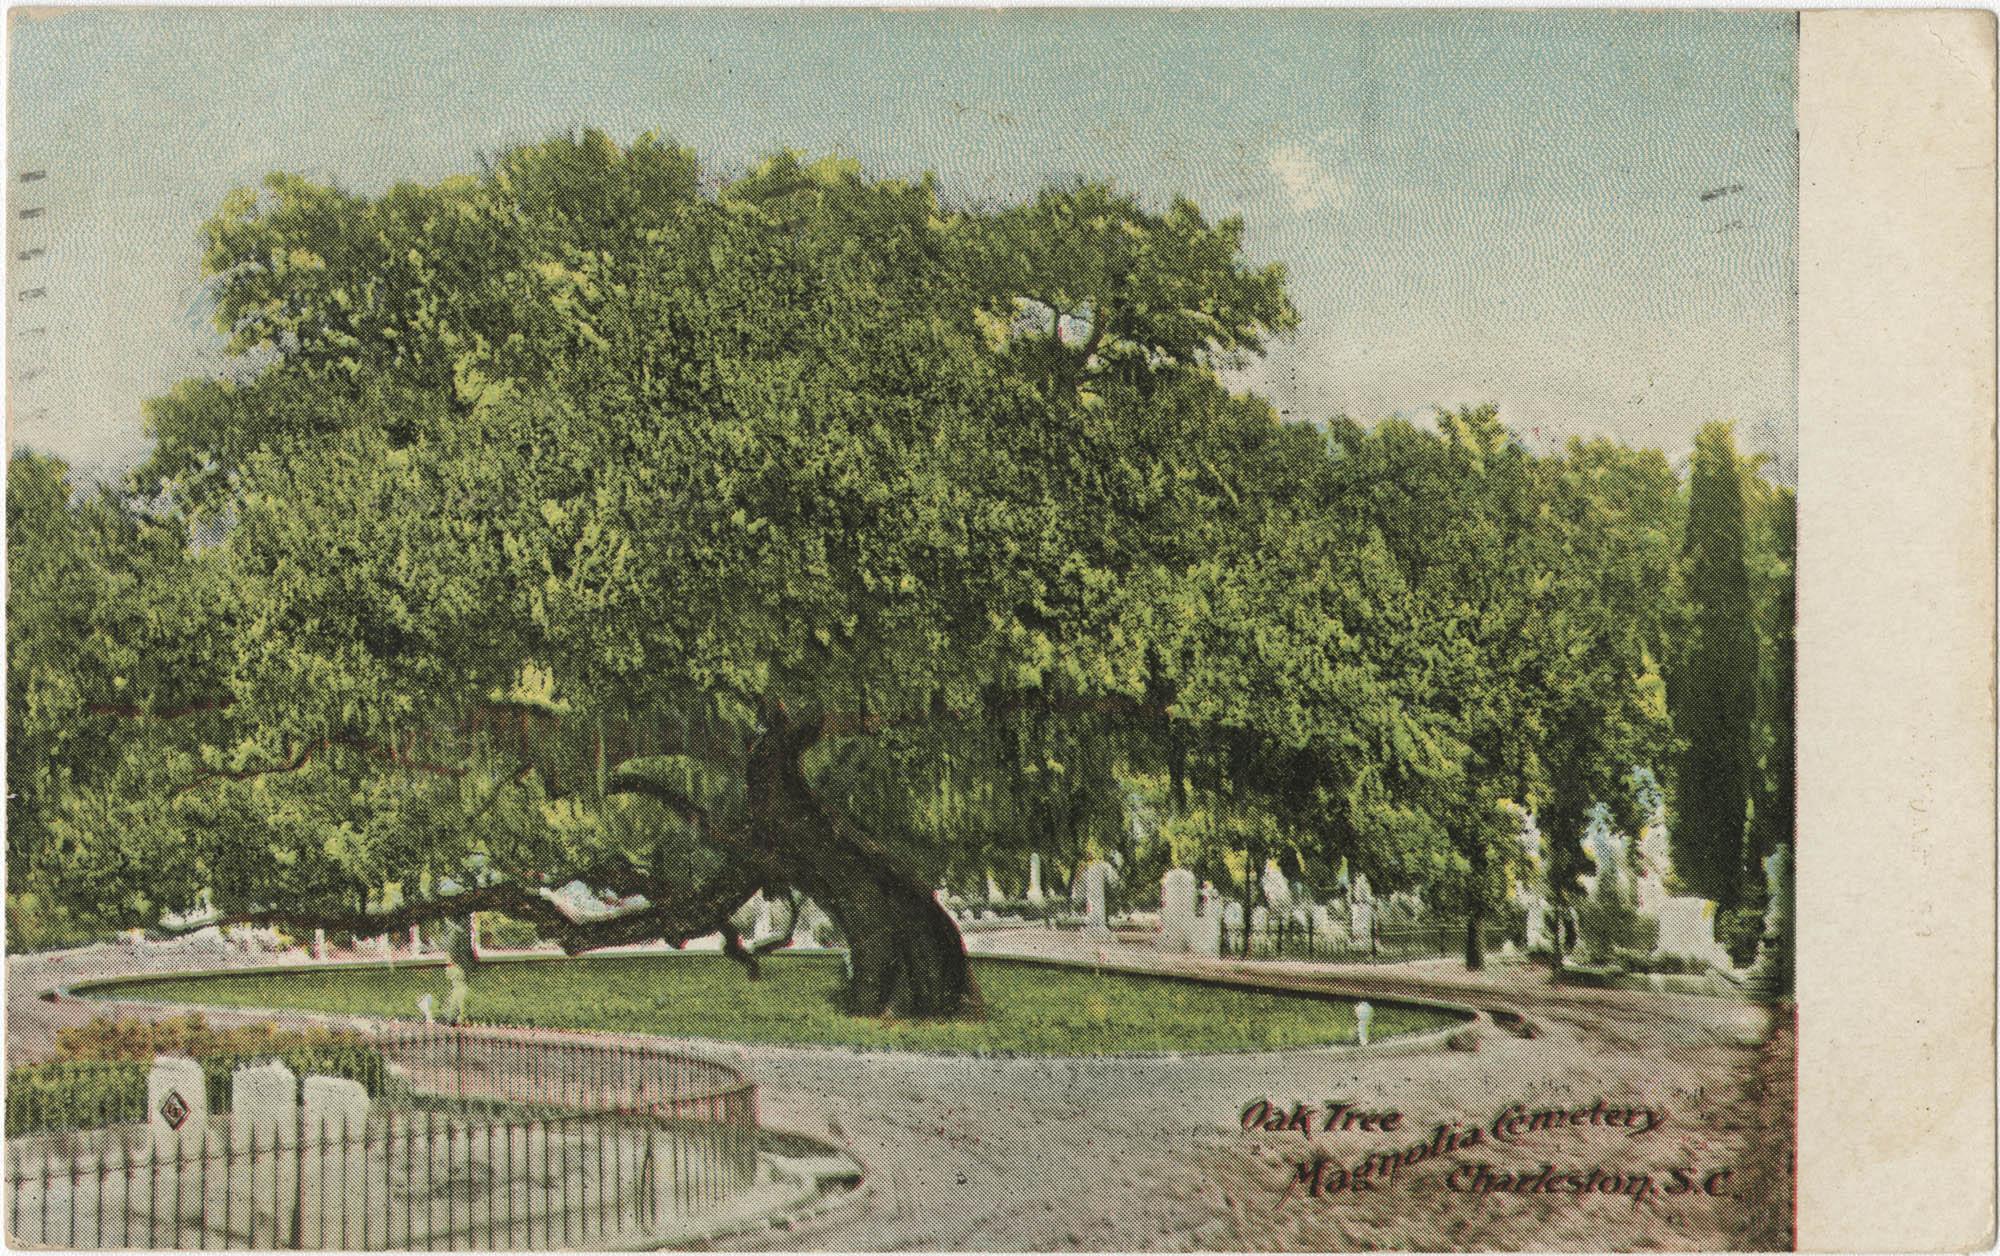 Oak Tree, Magnolia Cemetery, Charleston, S.C.